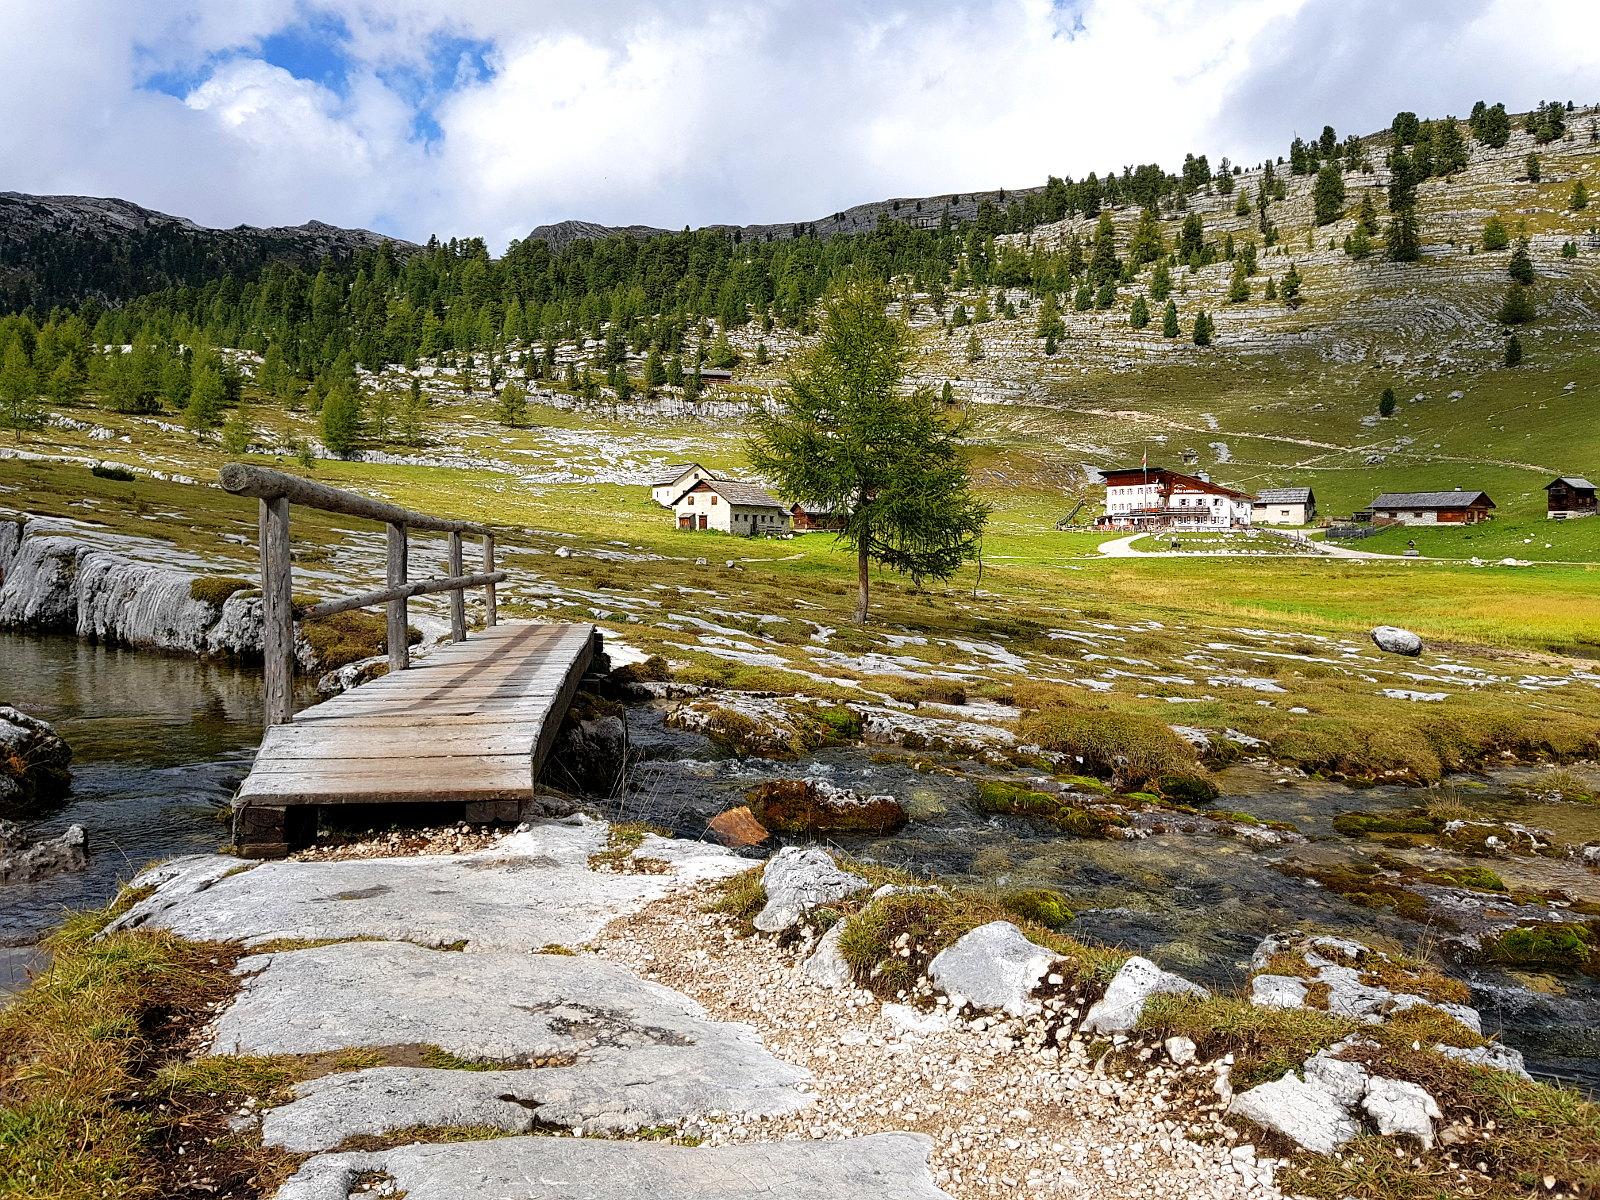 grandiose Bergpanoramen und Hütten begleiten uns